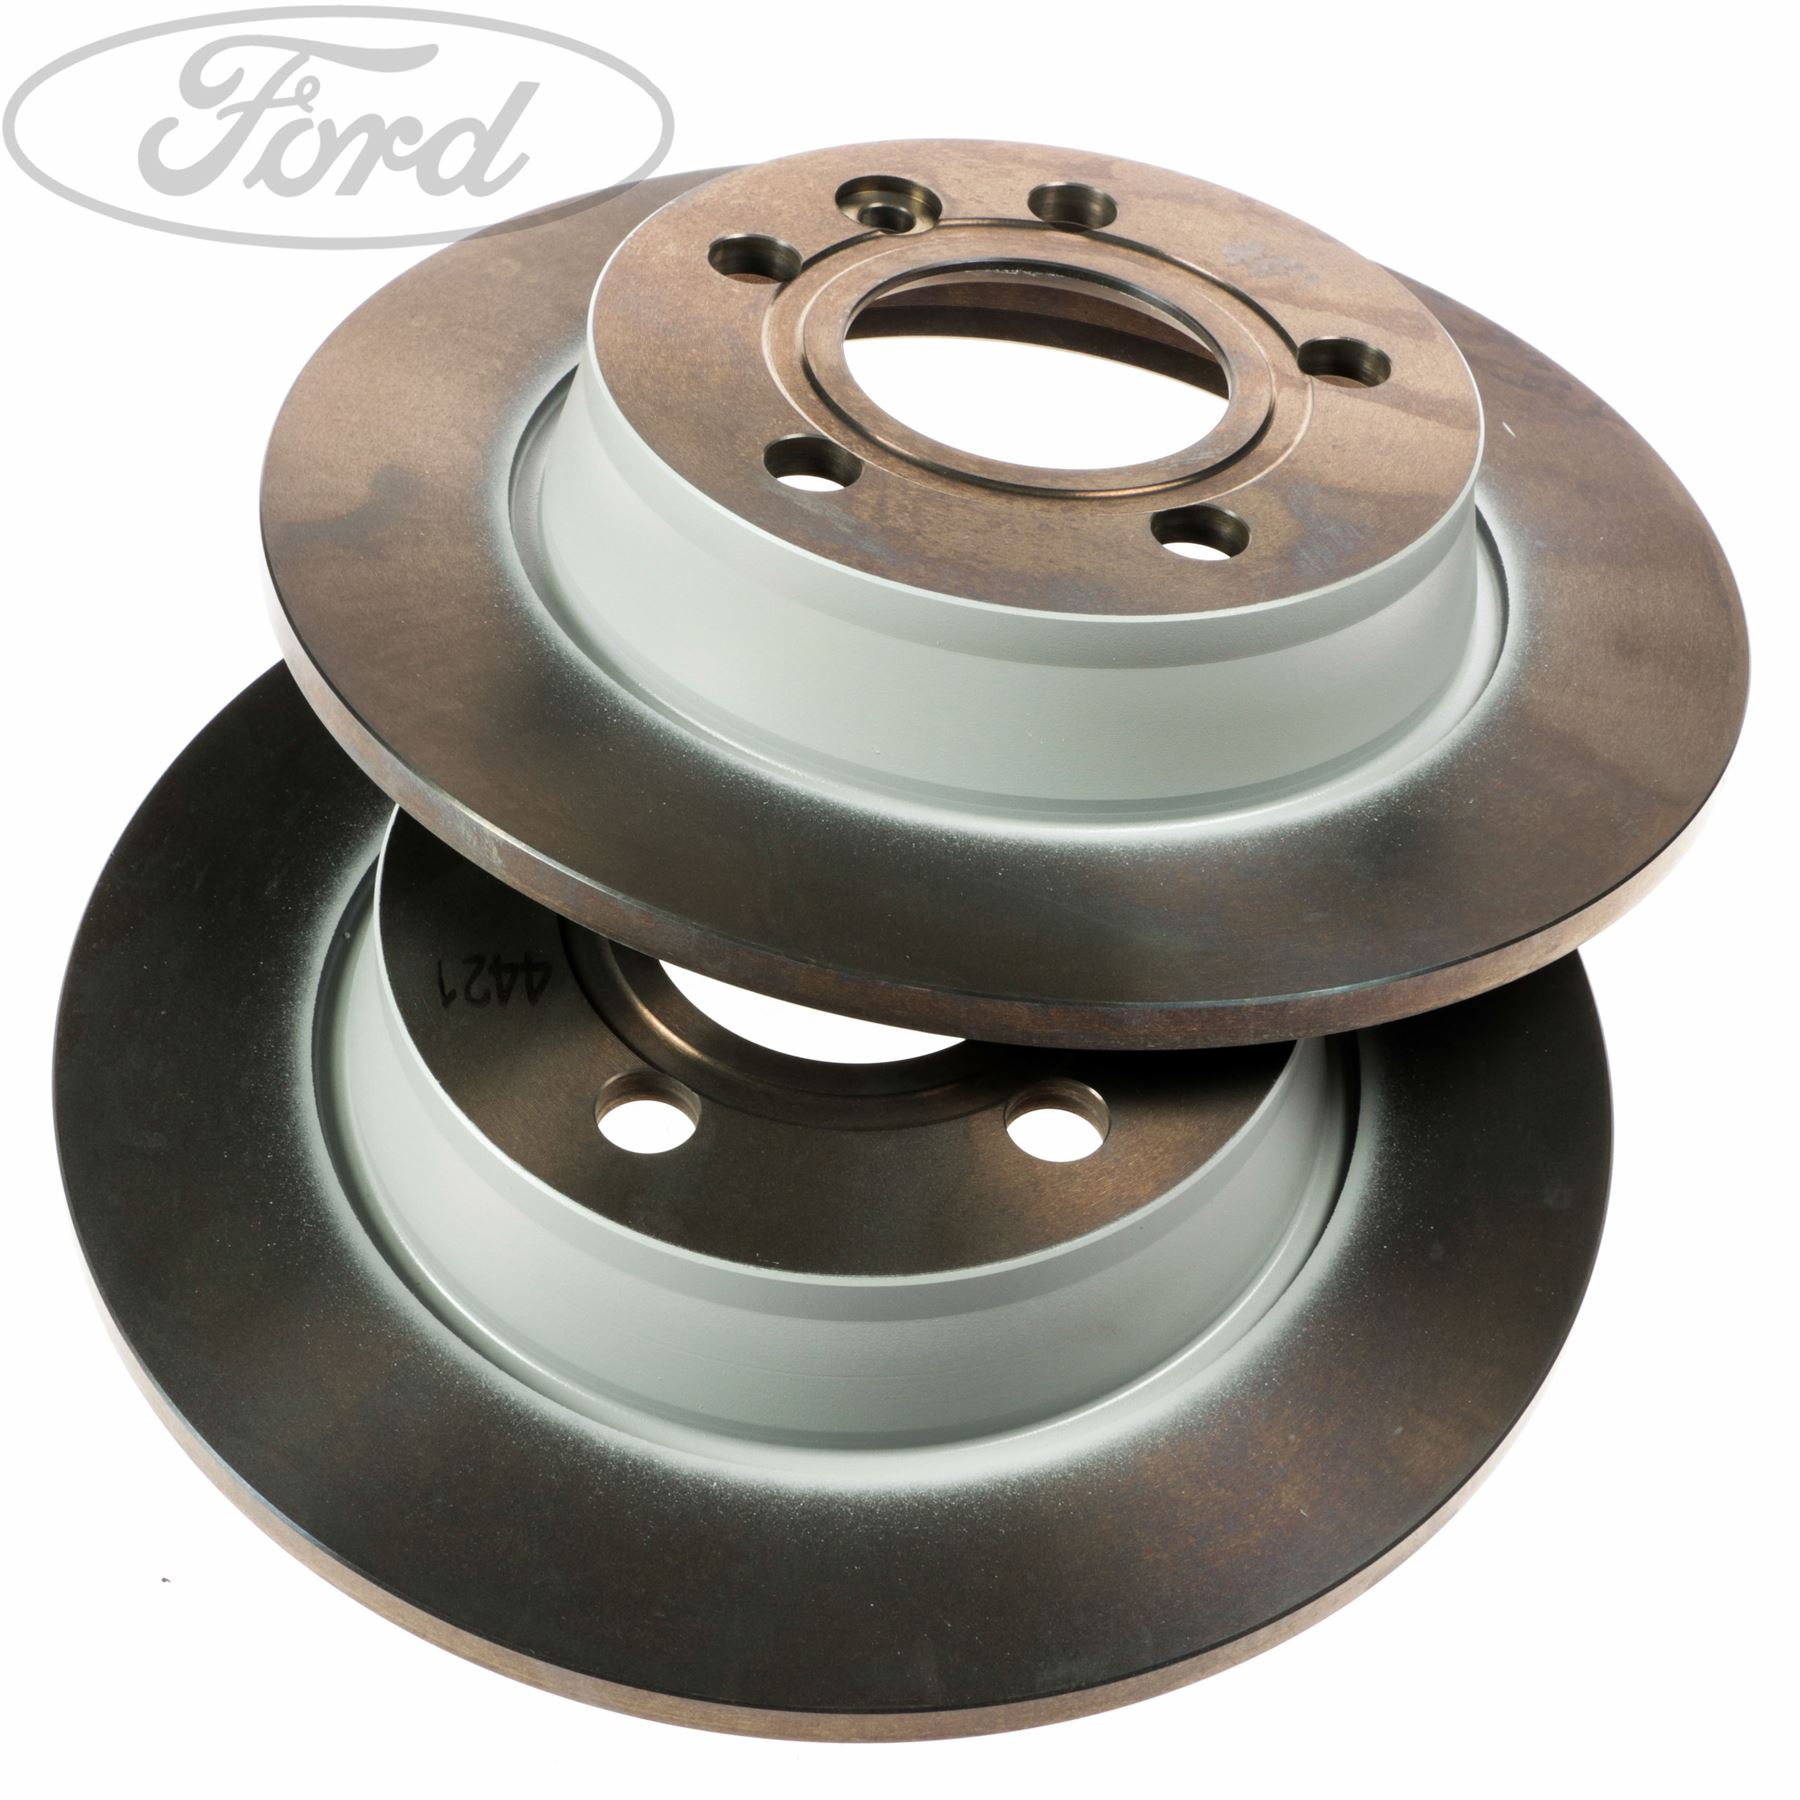 Brake Discs 268mm Solid Ford Galaxy 2.3 16V 2.8 V6 Rear Delphi Brake Pads